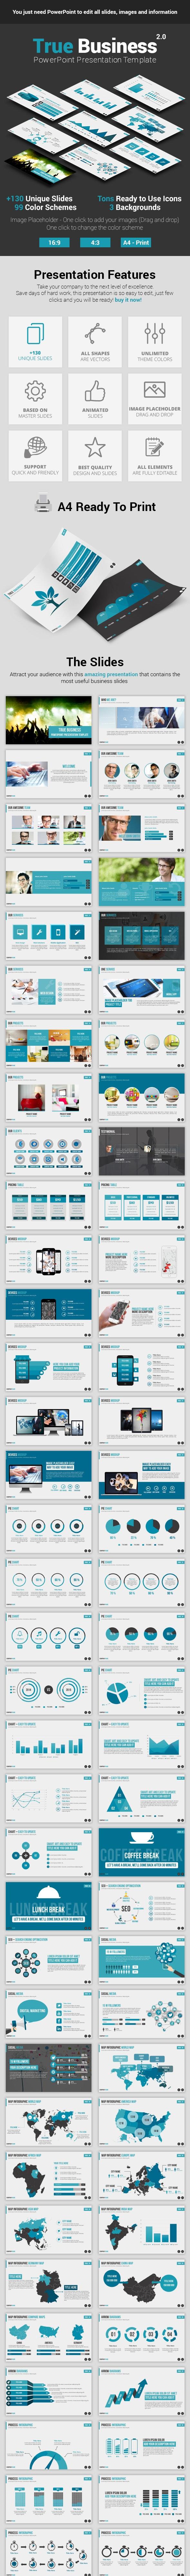 True Business PowerPoint Presentation Template - Business PowerPoint Templates